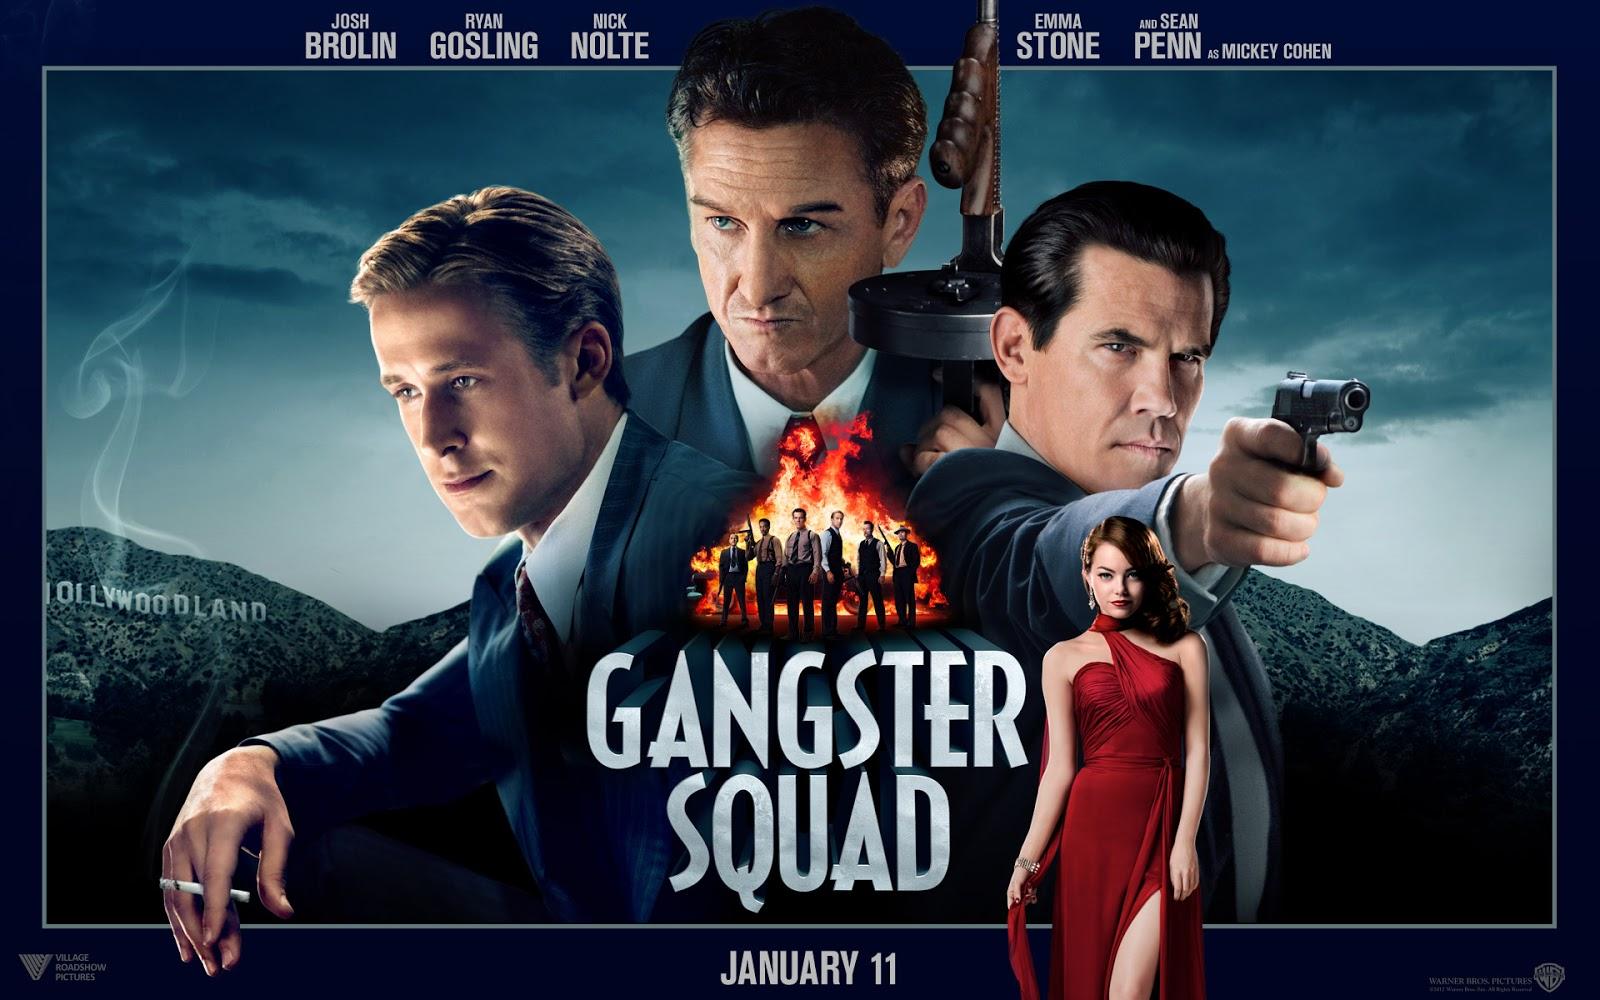 http://1.bp.blogspot.com/-emIVmAbpcW0/UPTLIQe2tkI/AAAAAAAABpk/mmI-Bweotss/s1600/gangster_squad-wide.jpg